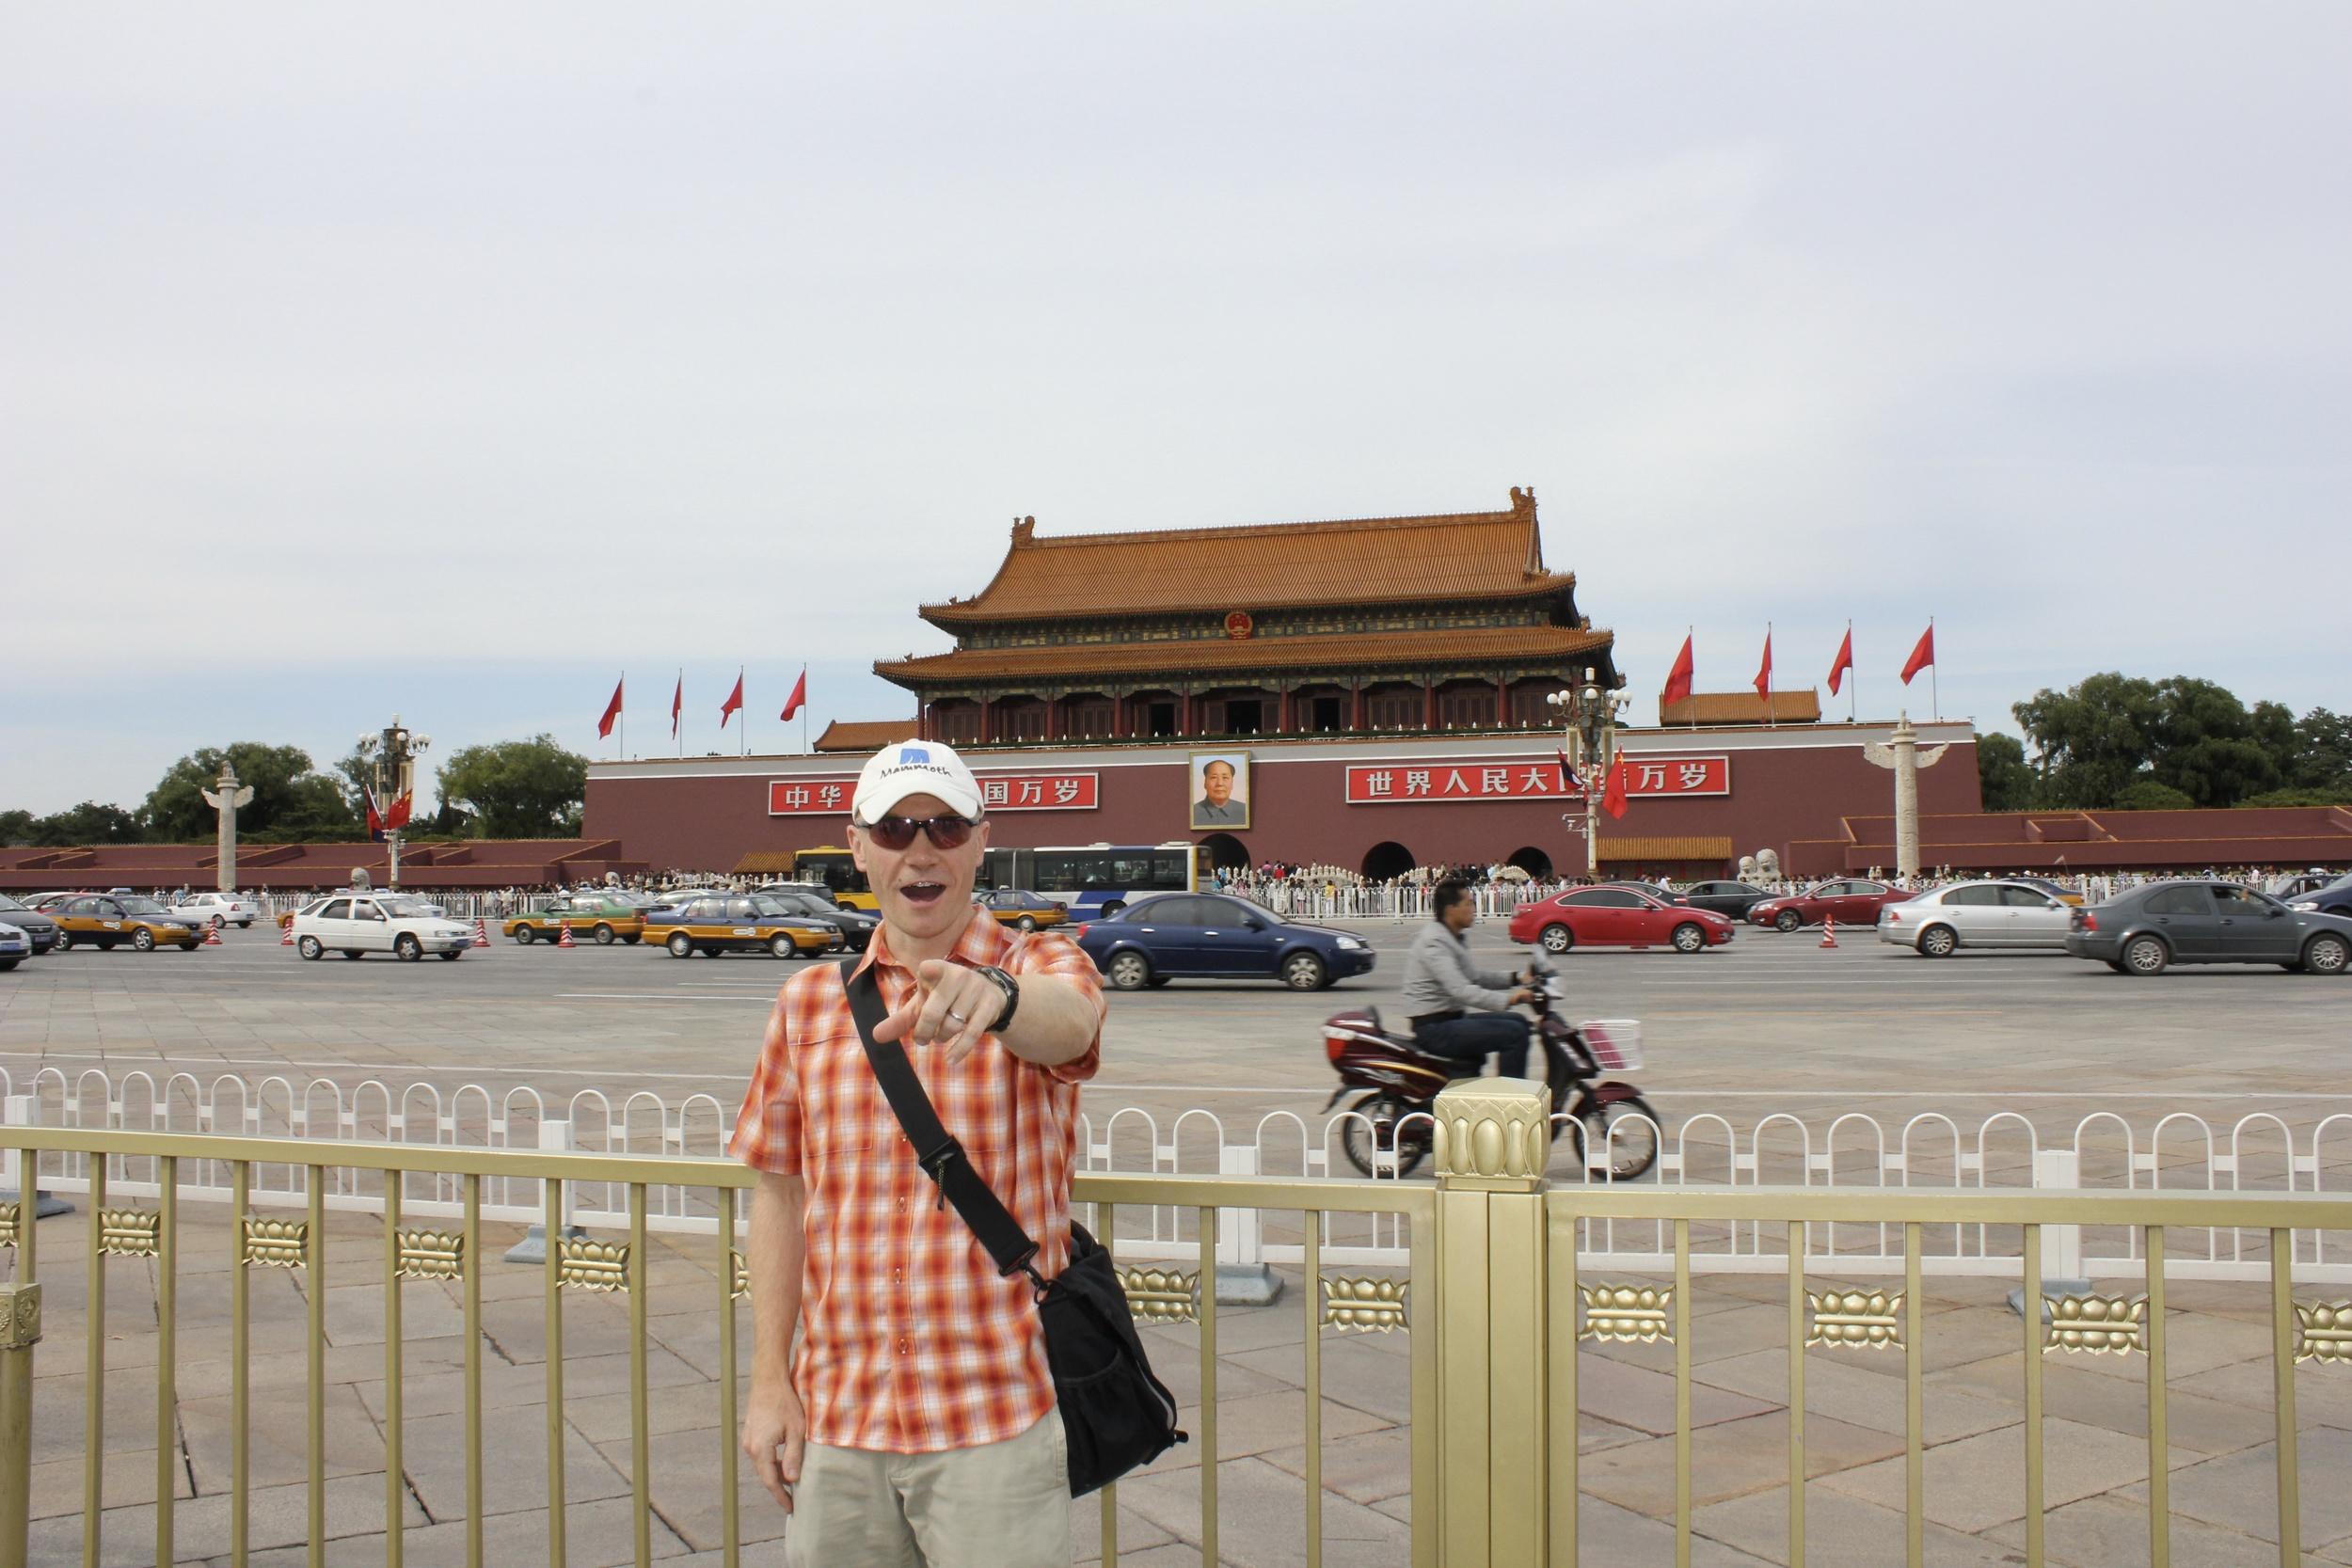 "Tiananmen Square & Me.September 2011. Beijing, China                                0     false             18 pt     18 pt     0     0         false     false     false                                                          /* Style Definitions */ table.MsoNormalTable {mso-style-name:""Table Normal""; mso-tstyle-rowband-size:0; mso-tstyle-colband-size:0; mso-style-noshow:yes; mso-style-parent:""""; mso-padding-alt:0in 5.4pt 0in 5.4pt; mso-para-margin:0in; mso-para-margin-bottom:.0001pt; mso-pagination:widow-orphan; font-size:12.0pt; font-family:""Times New Roman""; mso-ascii-font-family:Cambria; mso-ascii-theme-font:minor-latin; mso-hansi-font-family:Cambria; mso-hansi-theme-font:minor-latin;}"